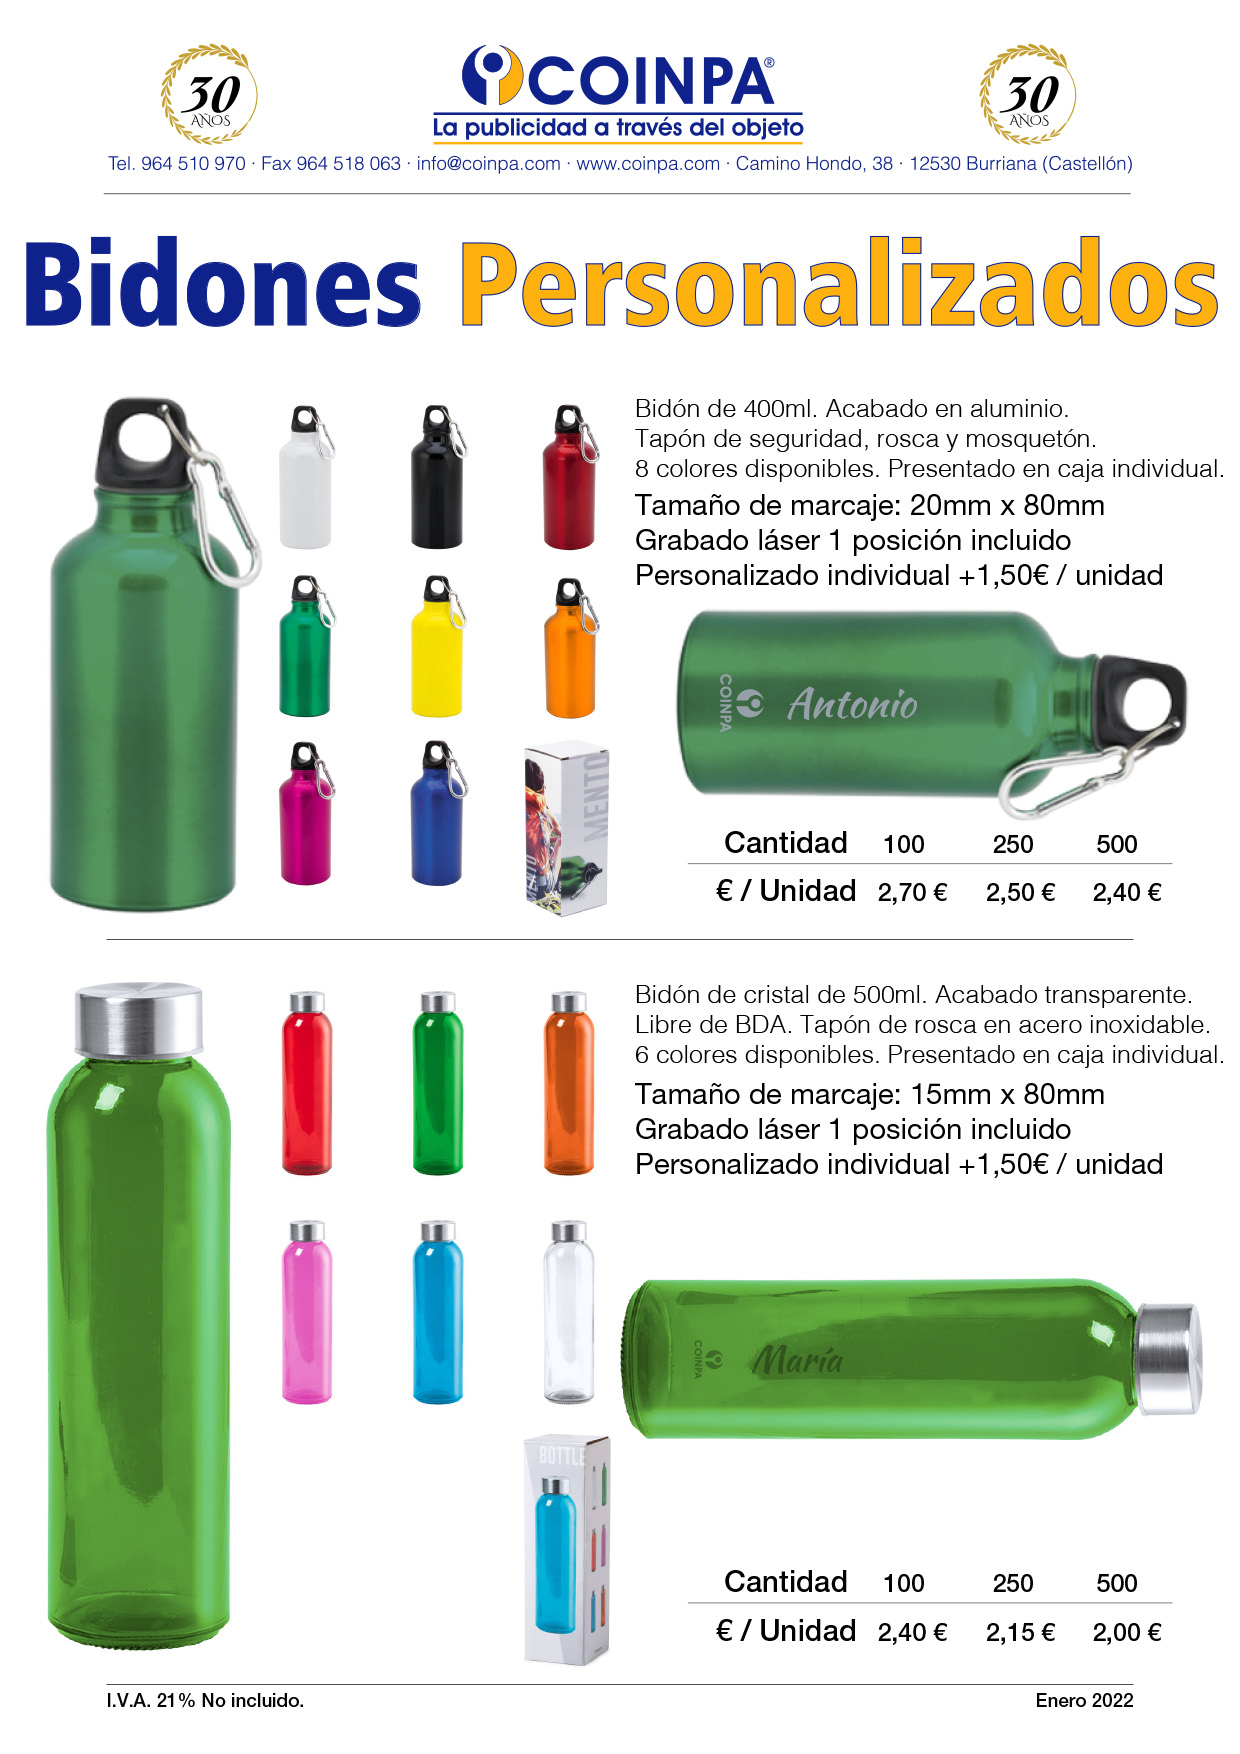 COINPA - Bidones personalizados